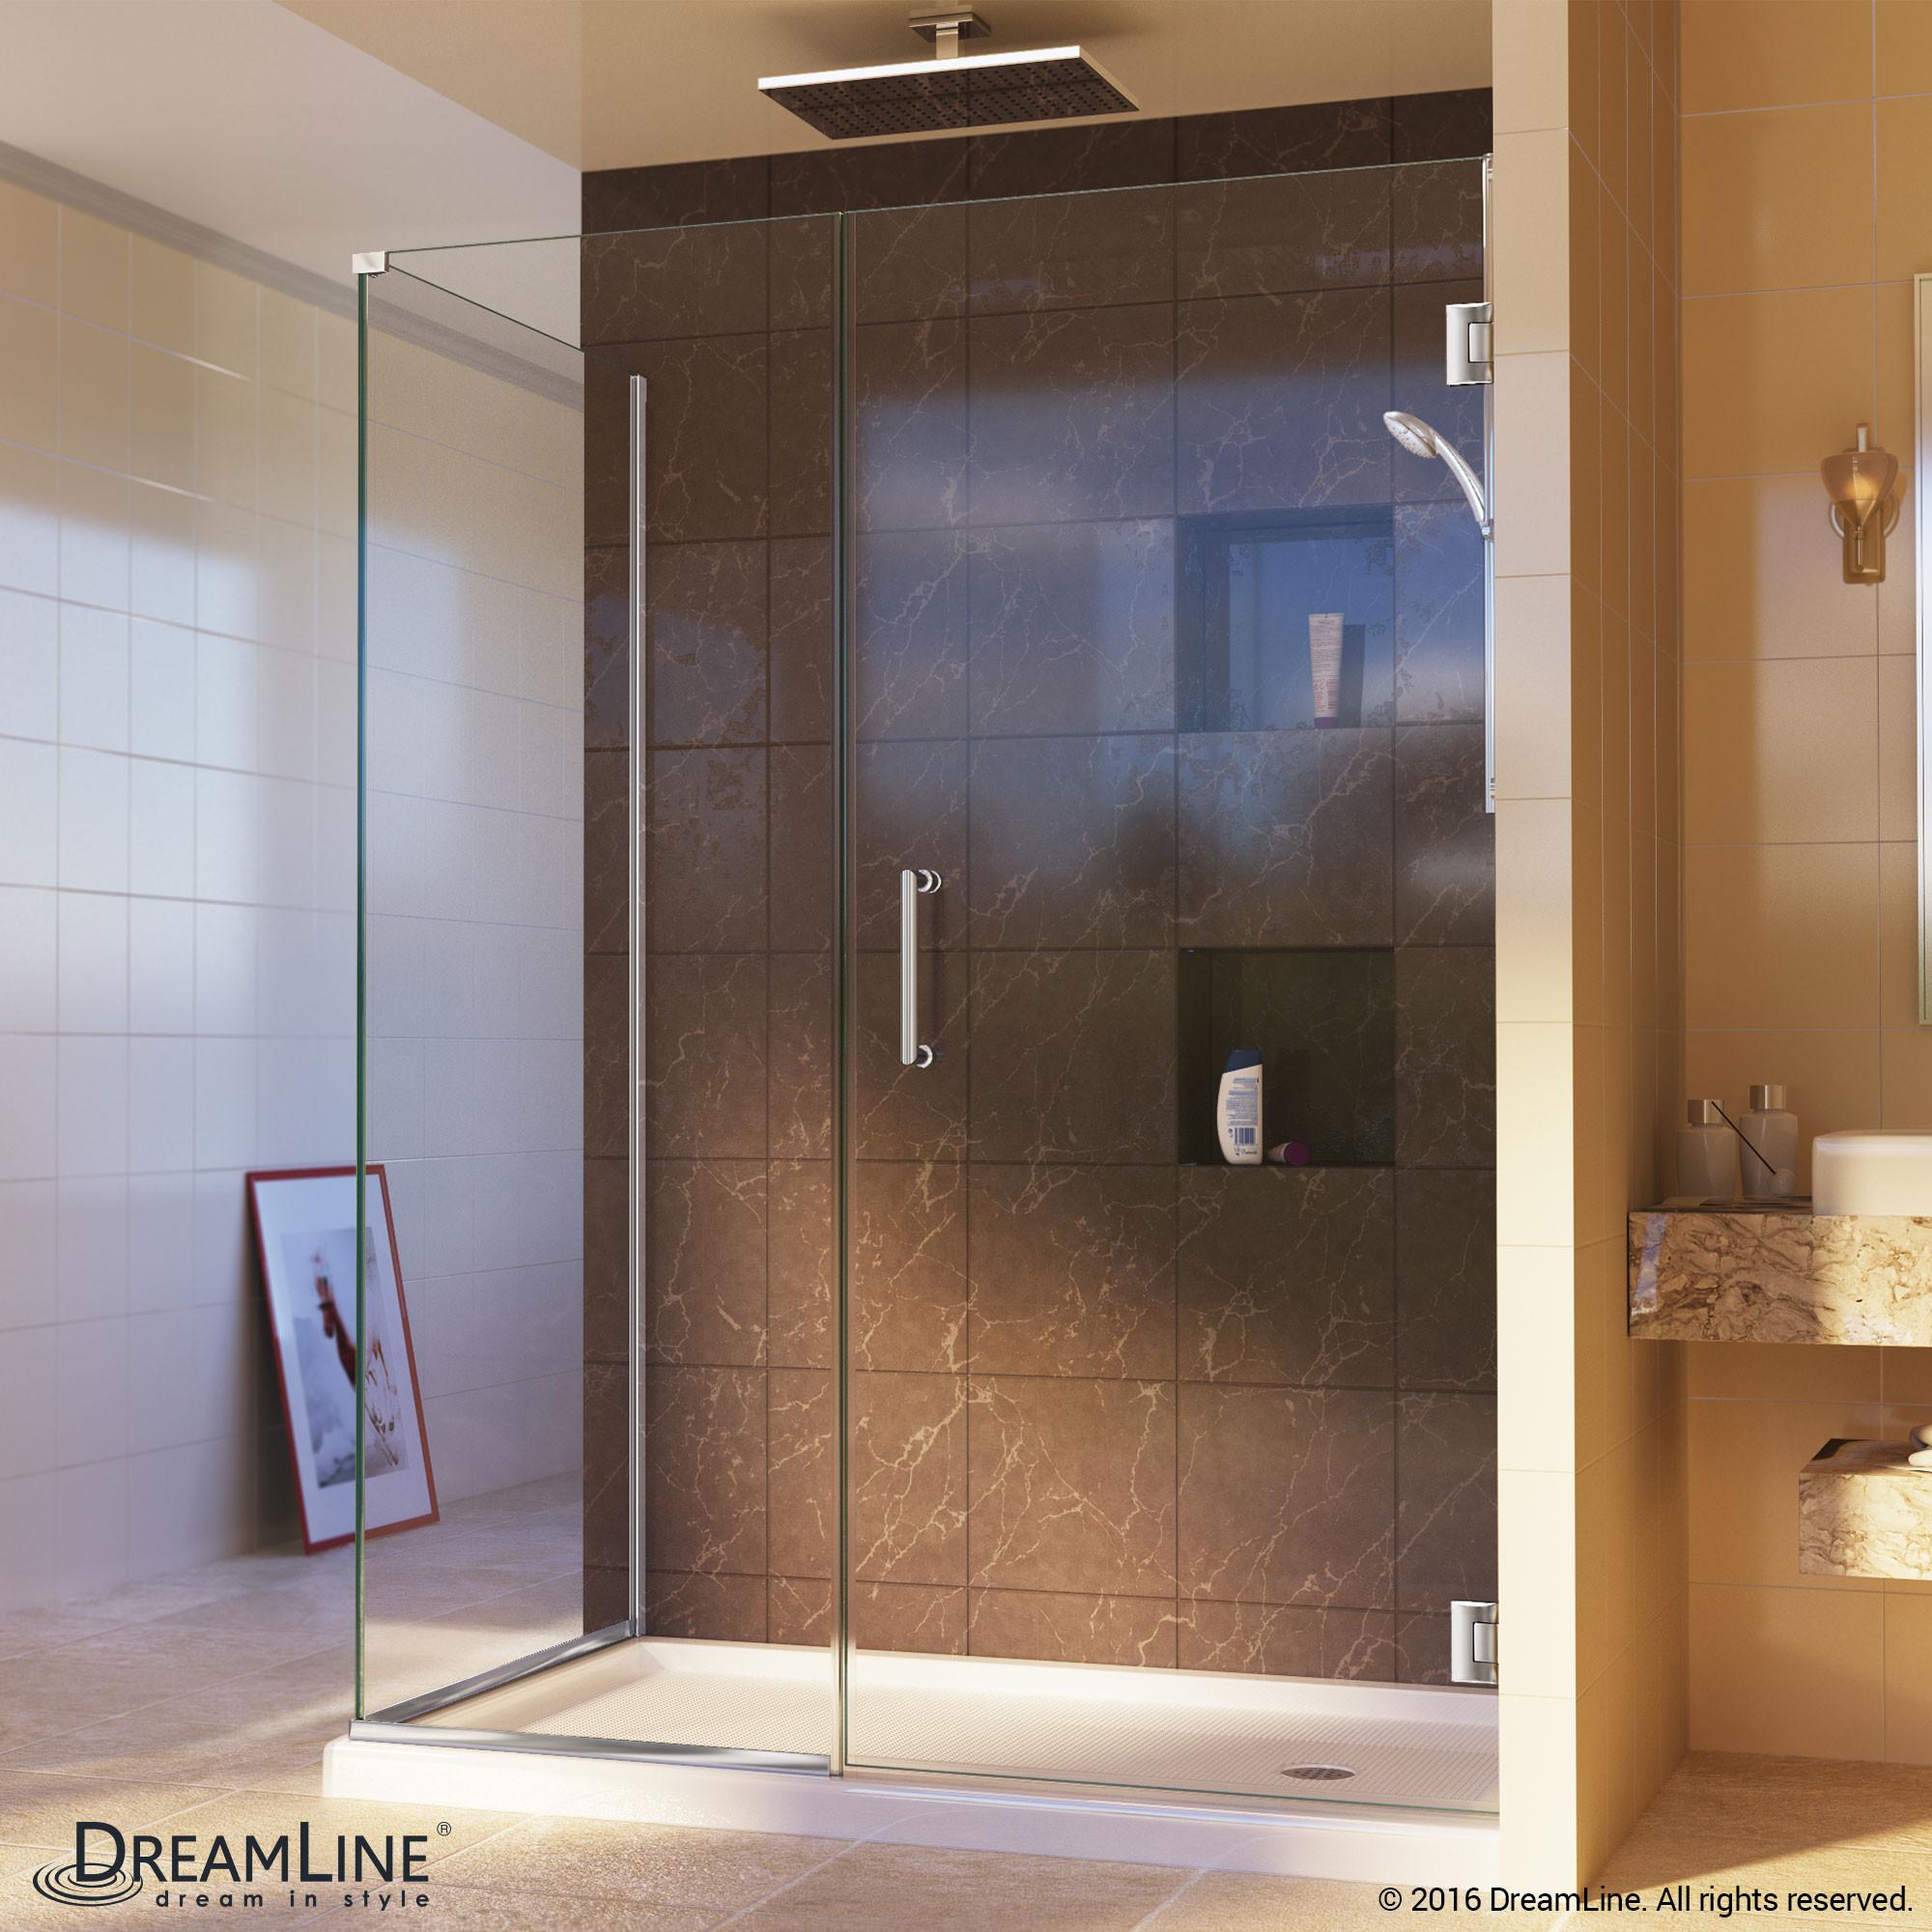 DreamLine SHEN-24490340-01 Unidoor Plus Hinged Shower Enclosure In Chrome Finish Hardware